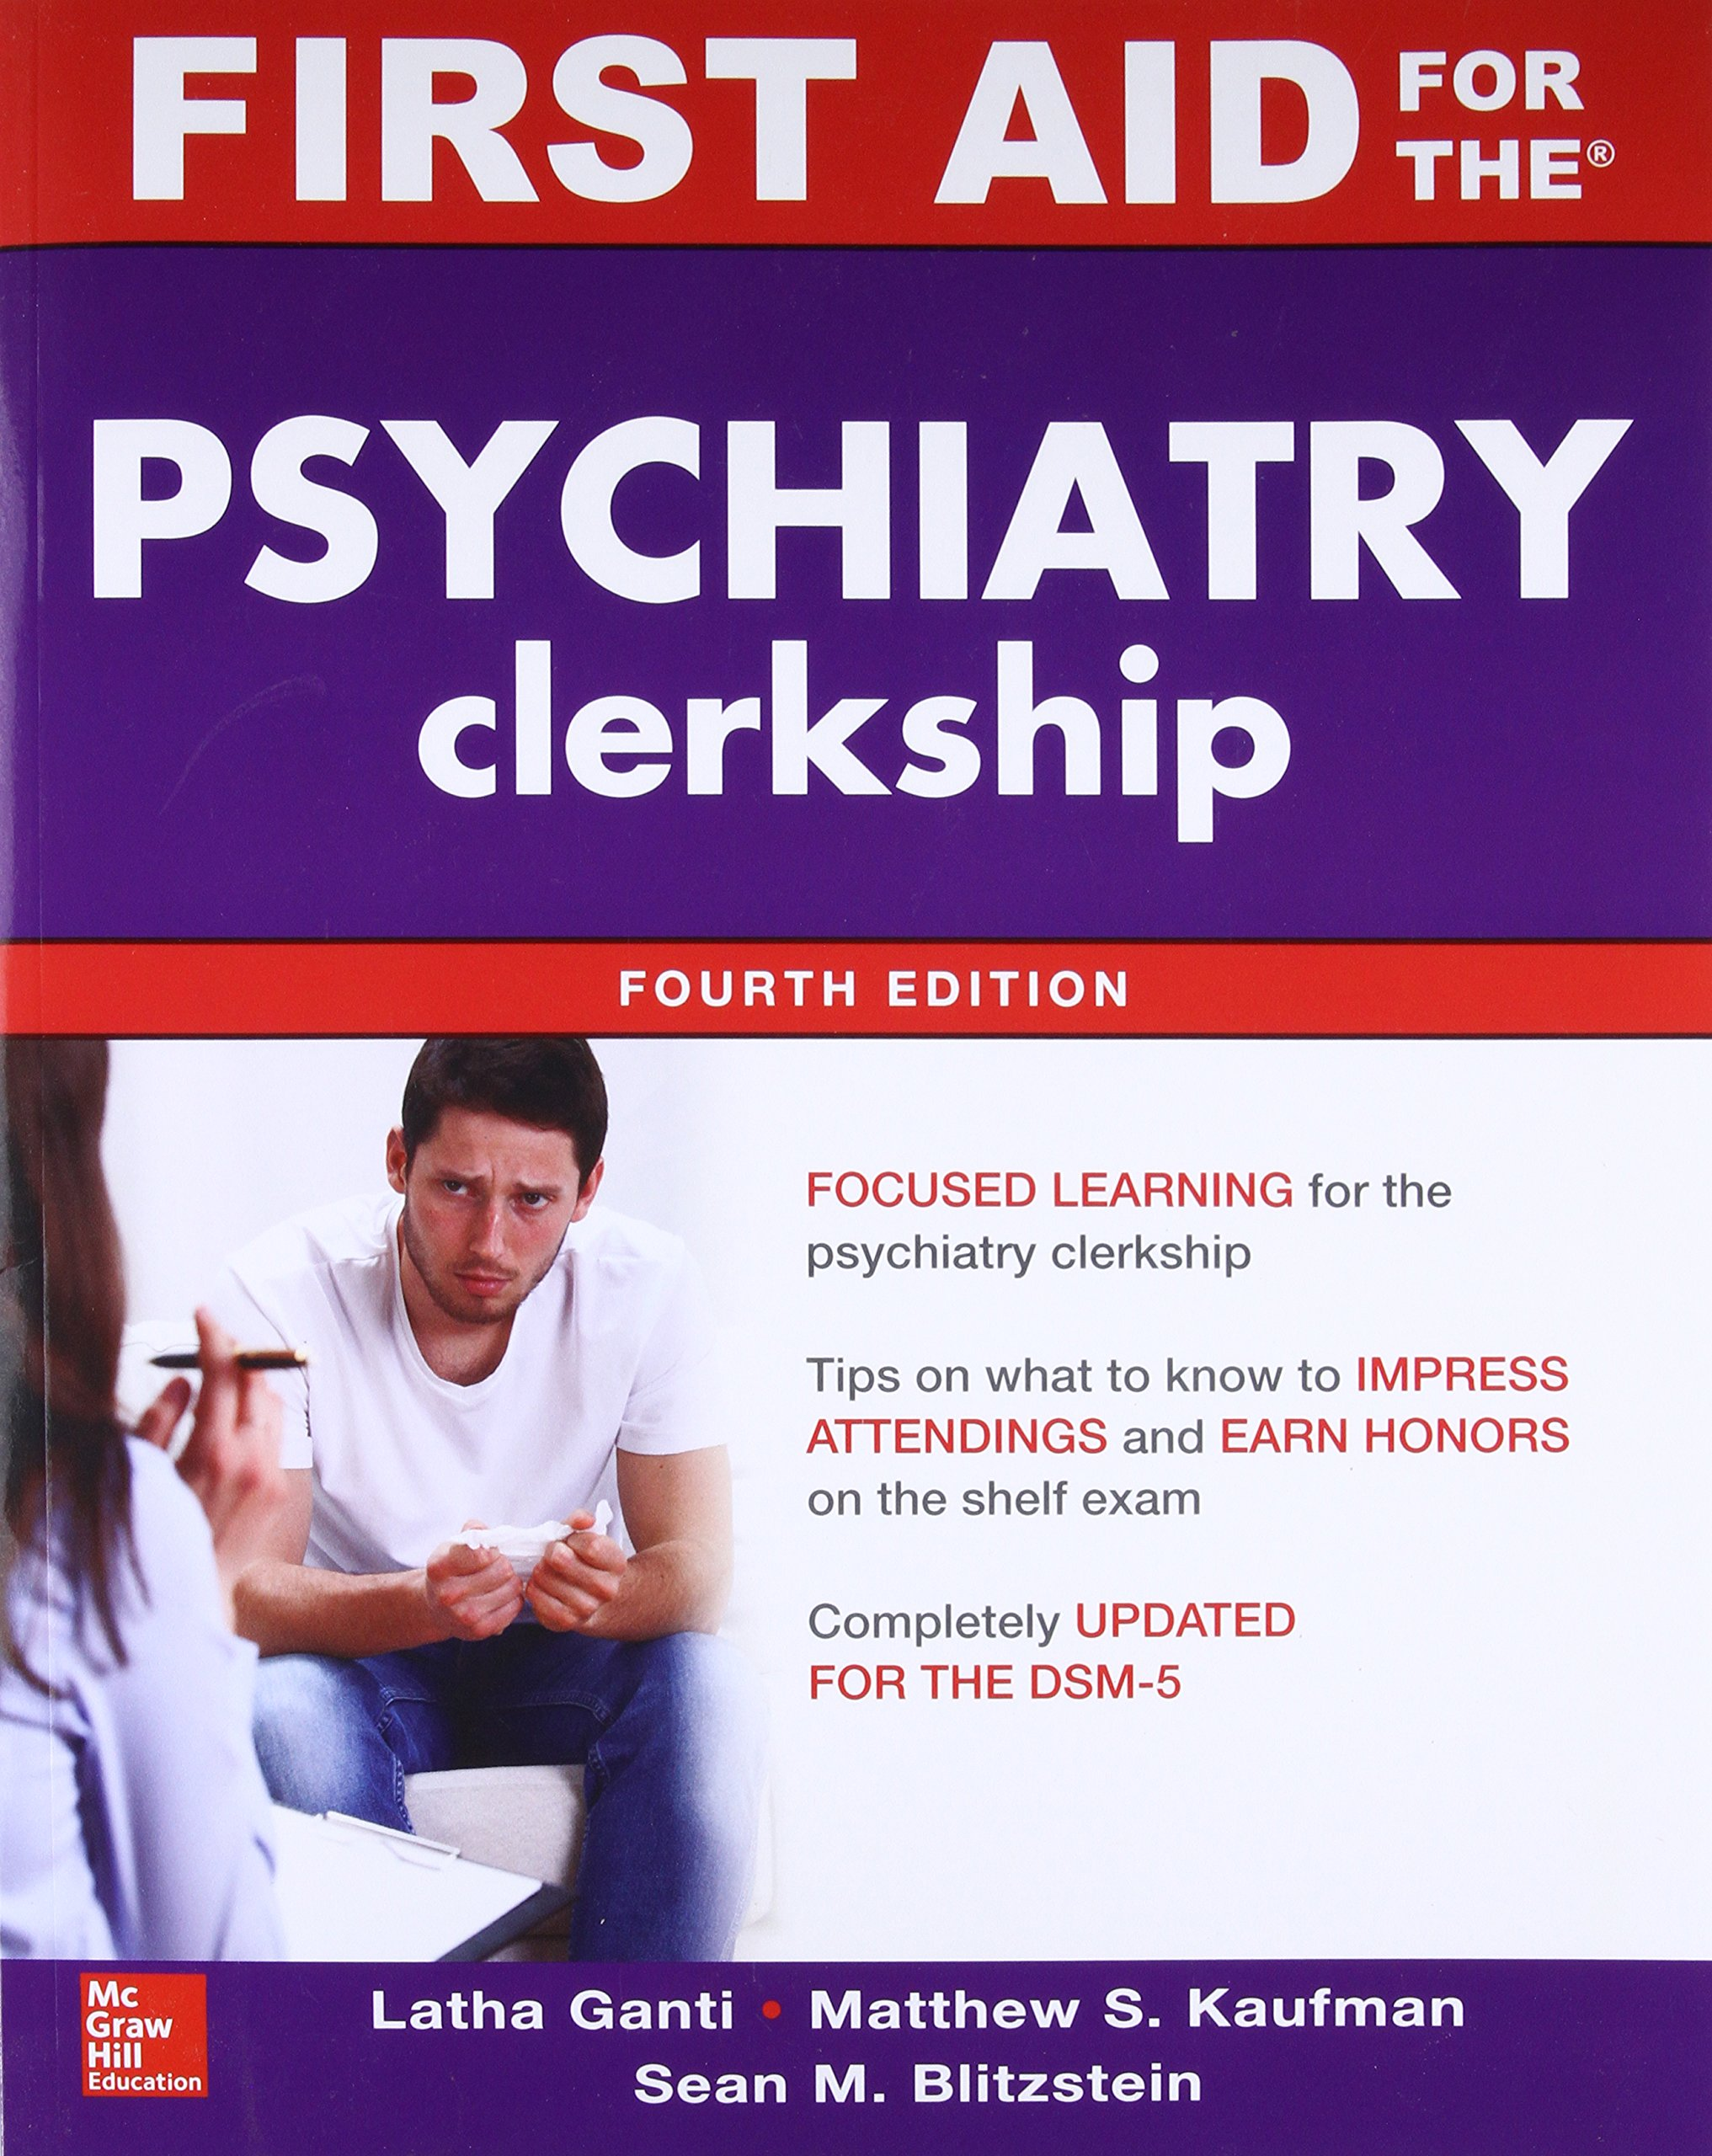 First Aid For The Psychiatry Clerkship Fourth Edition Latha Ganti